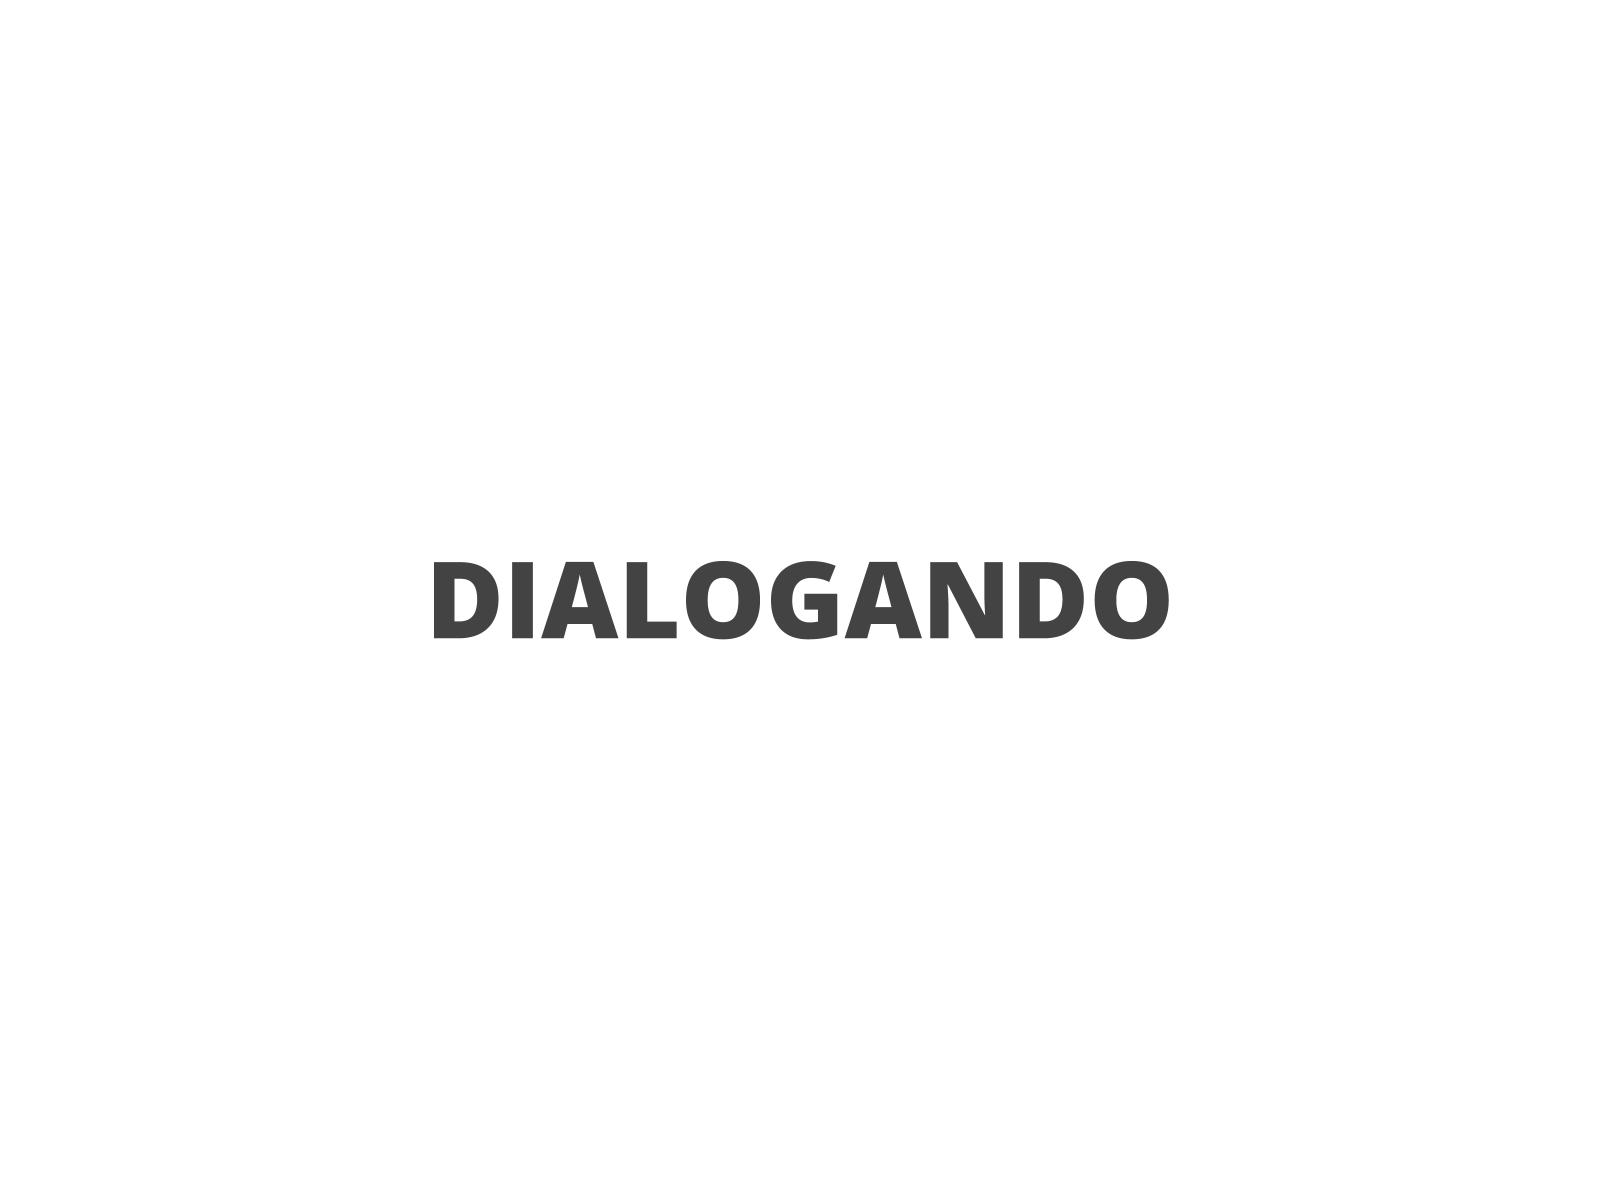 Diálogo em fábulas